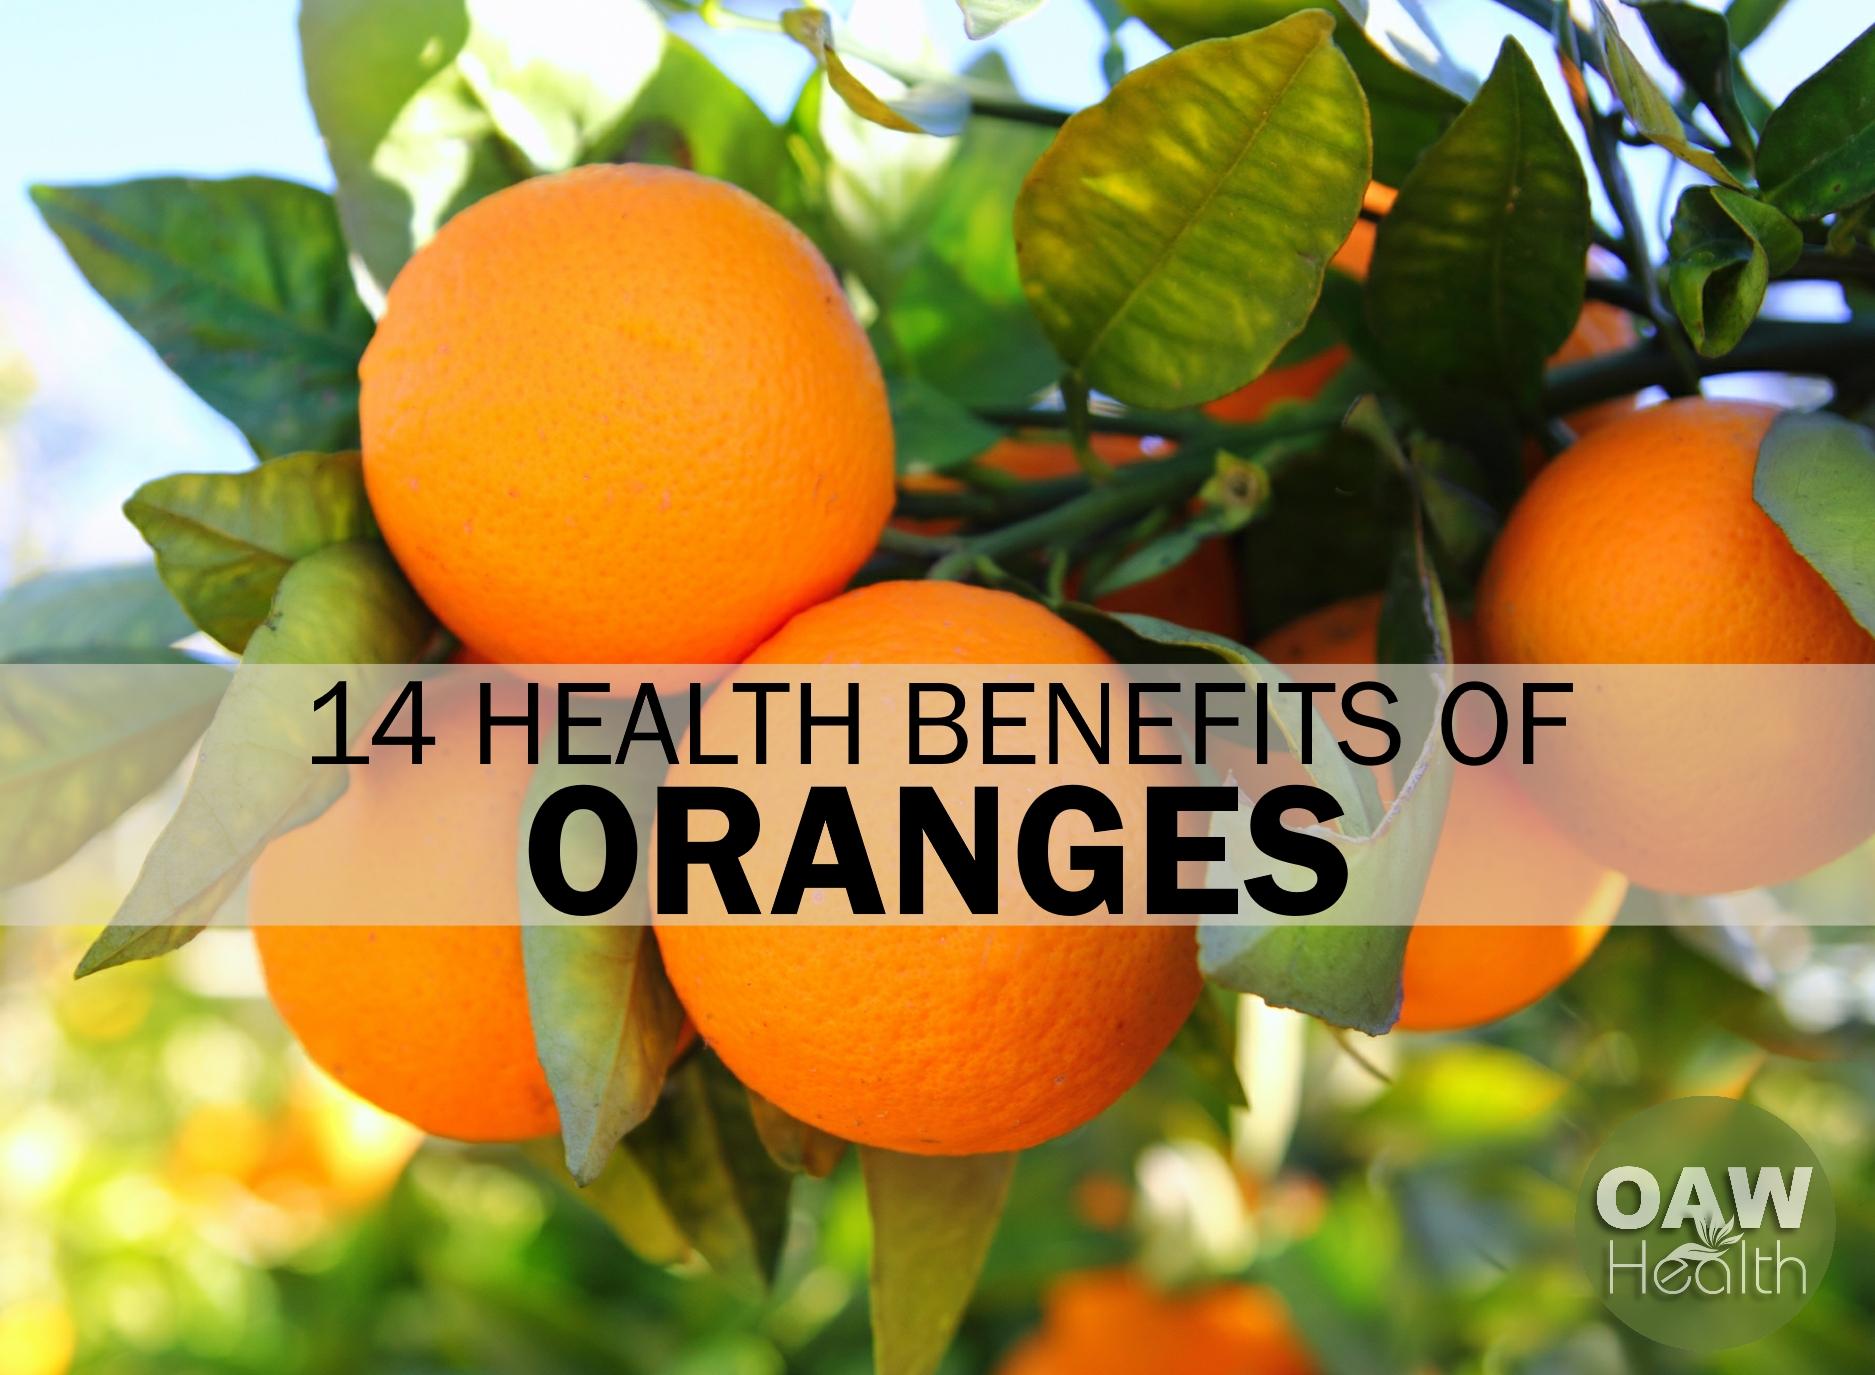 14 Health Benefits of Oranges